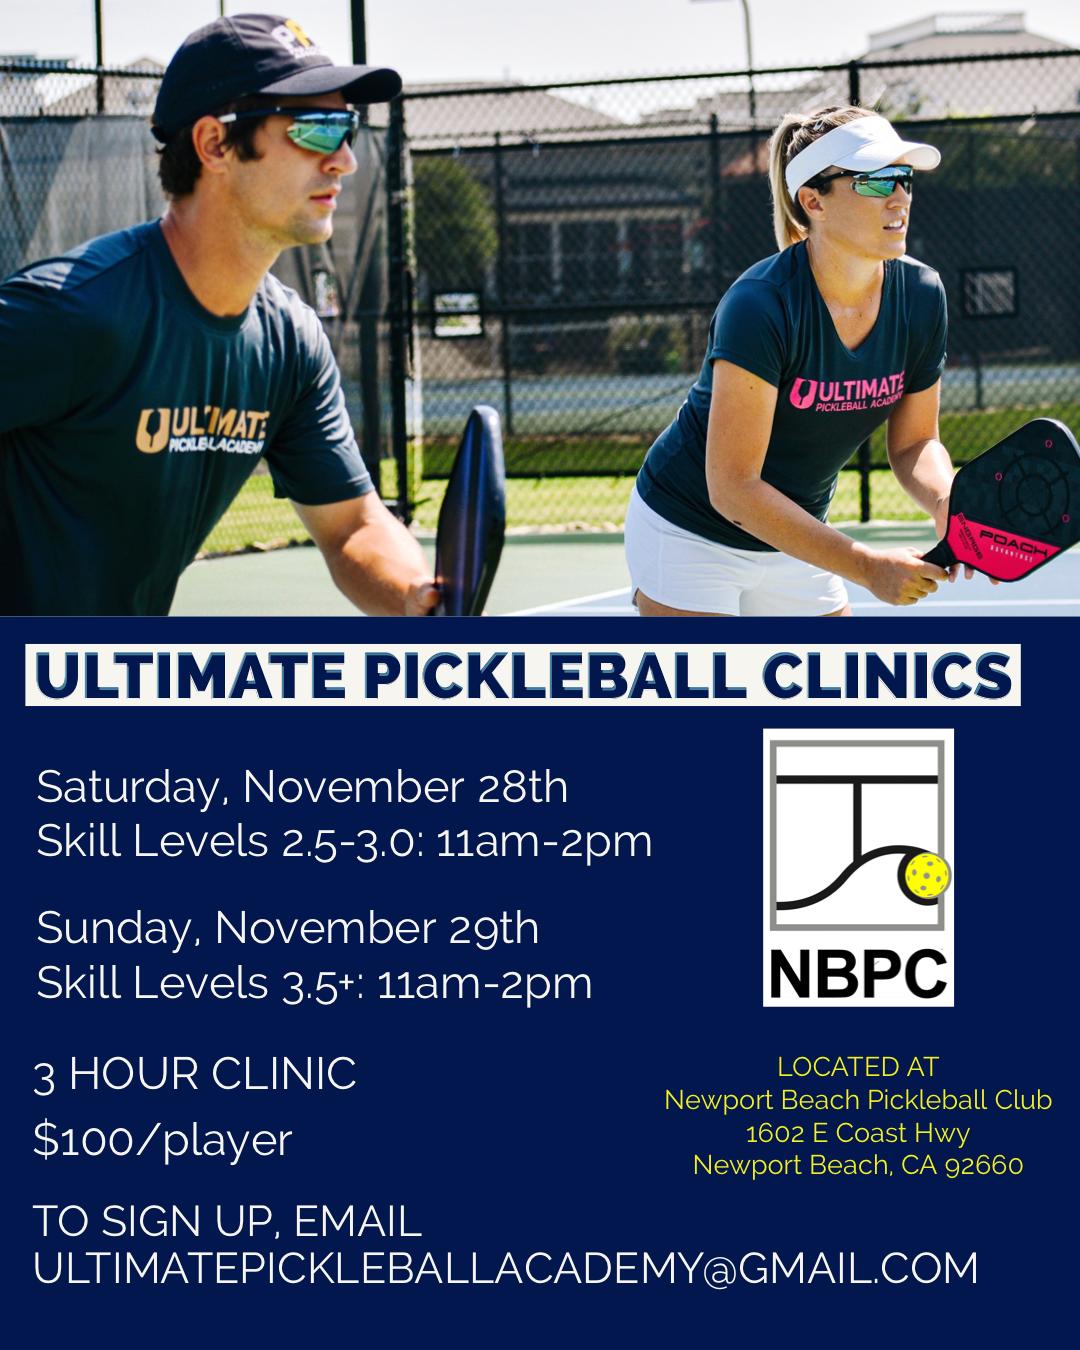 Ultimate Picjkleball Clinics